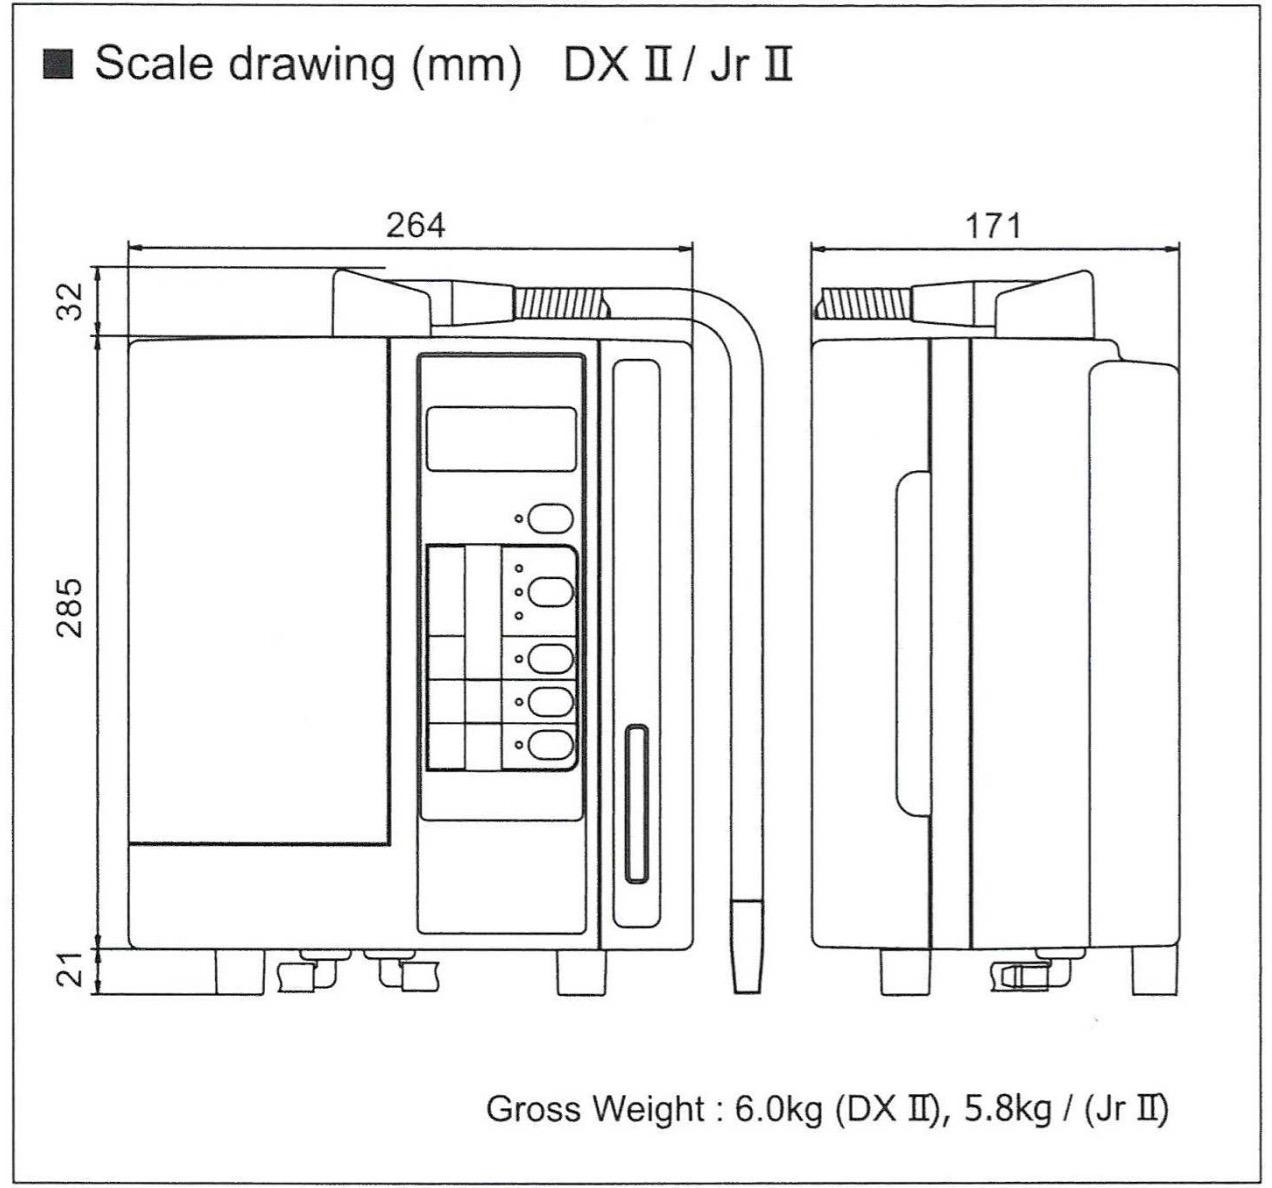 LeveLuk JR II Scale Drawing